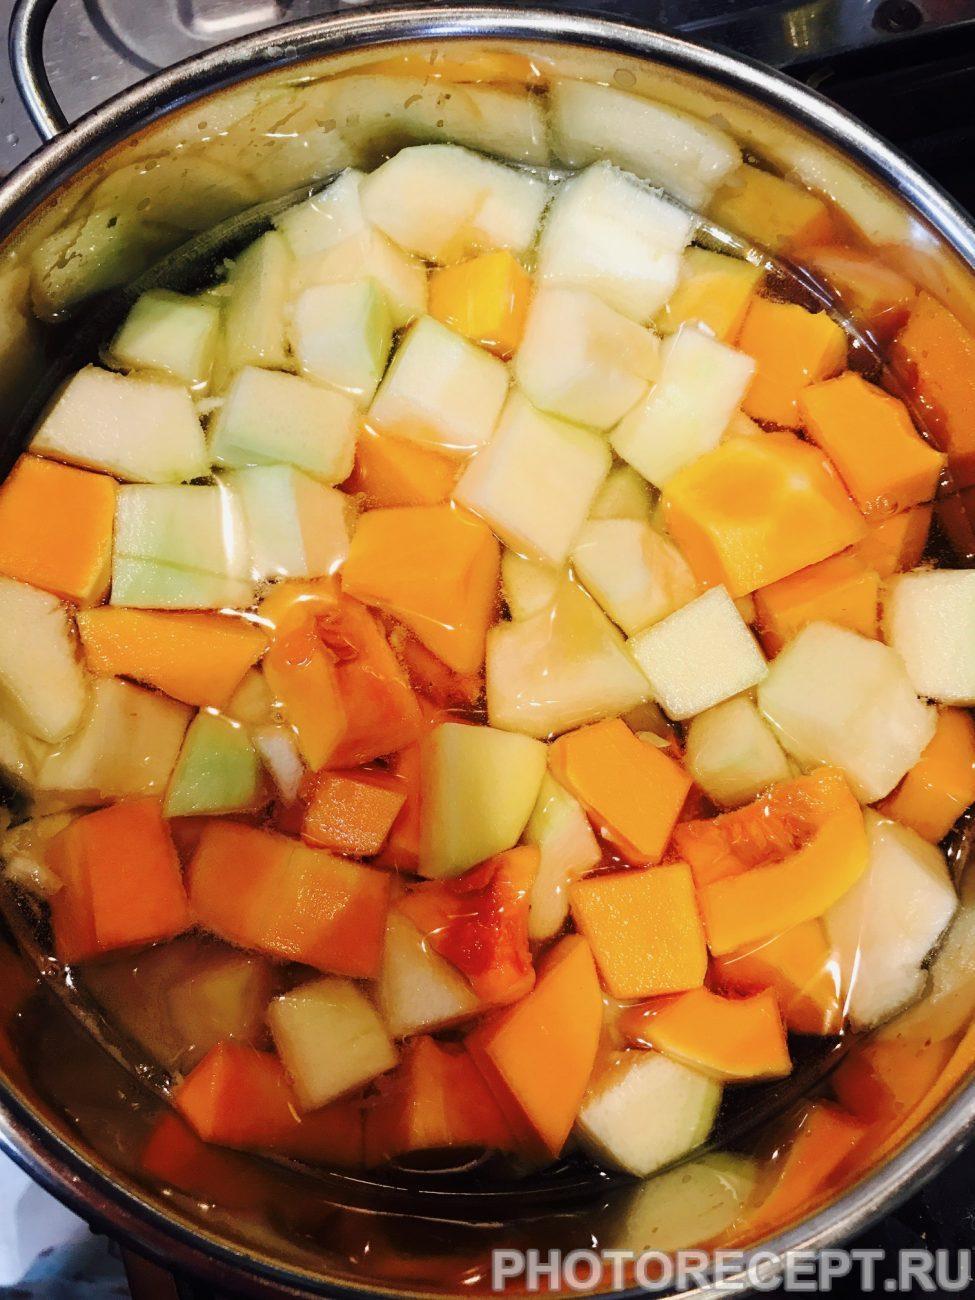 Рецепт курицы с кабачками пошагово